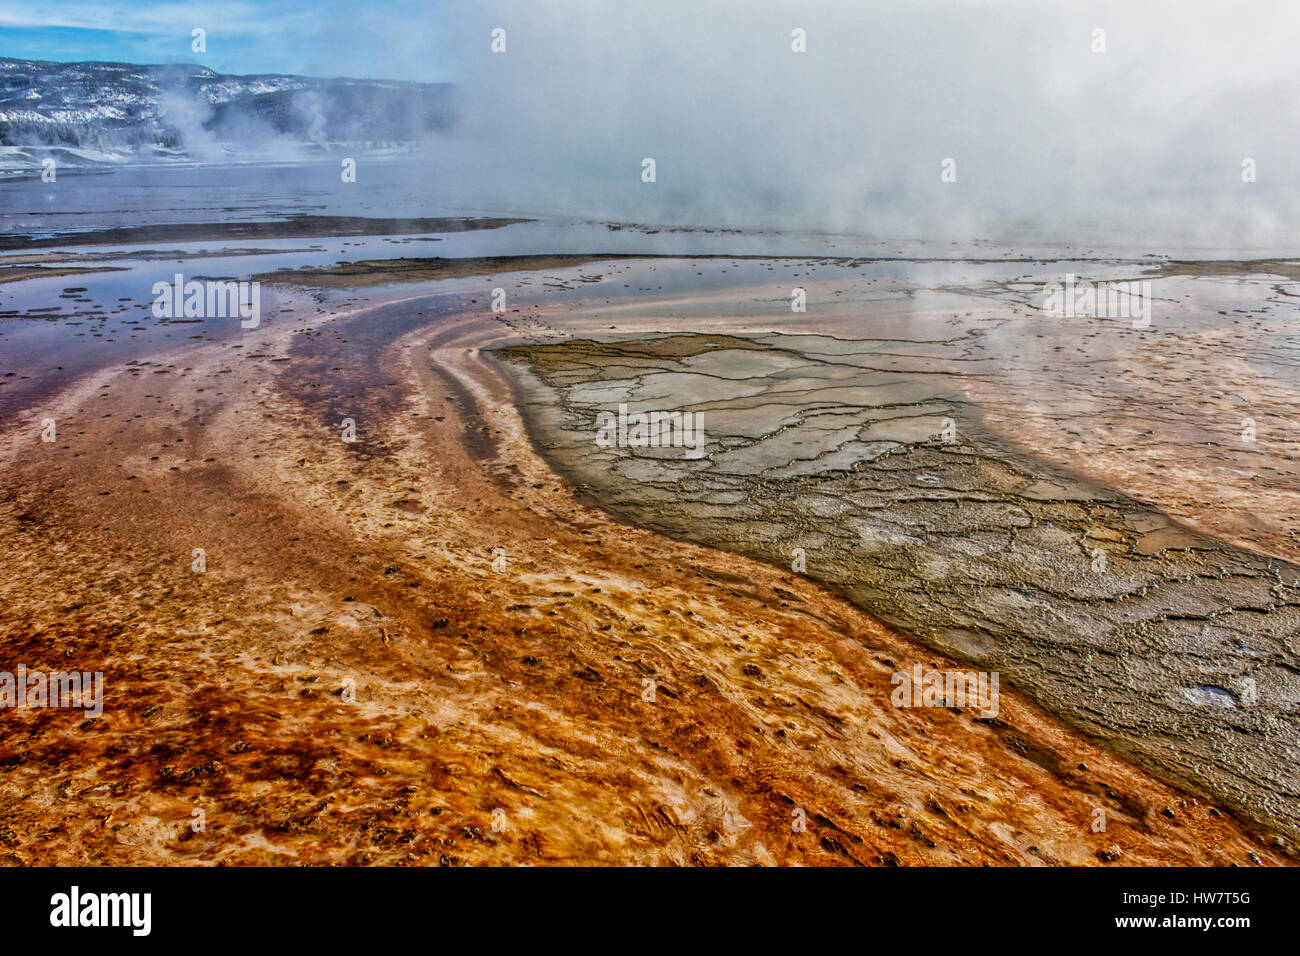 Mat bacteriana en Grand Prismatic Hot Spring, el Parque Nacional Yellowstone, Wyoming. Foto de stock